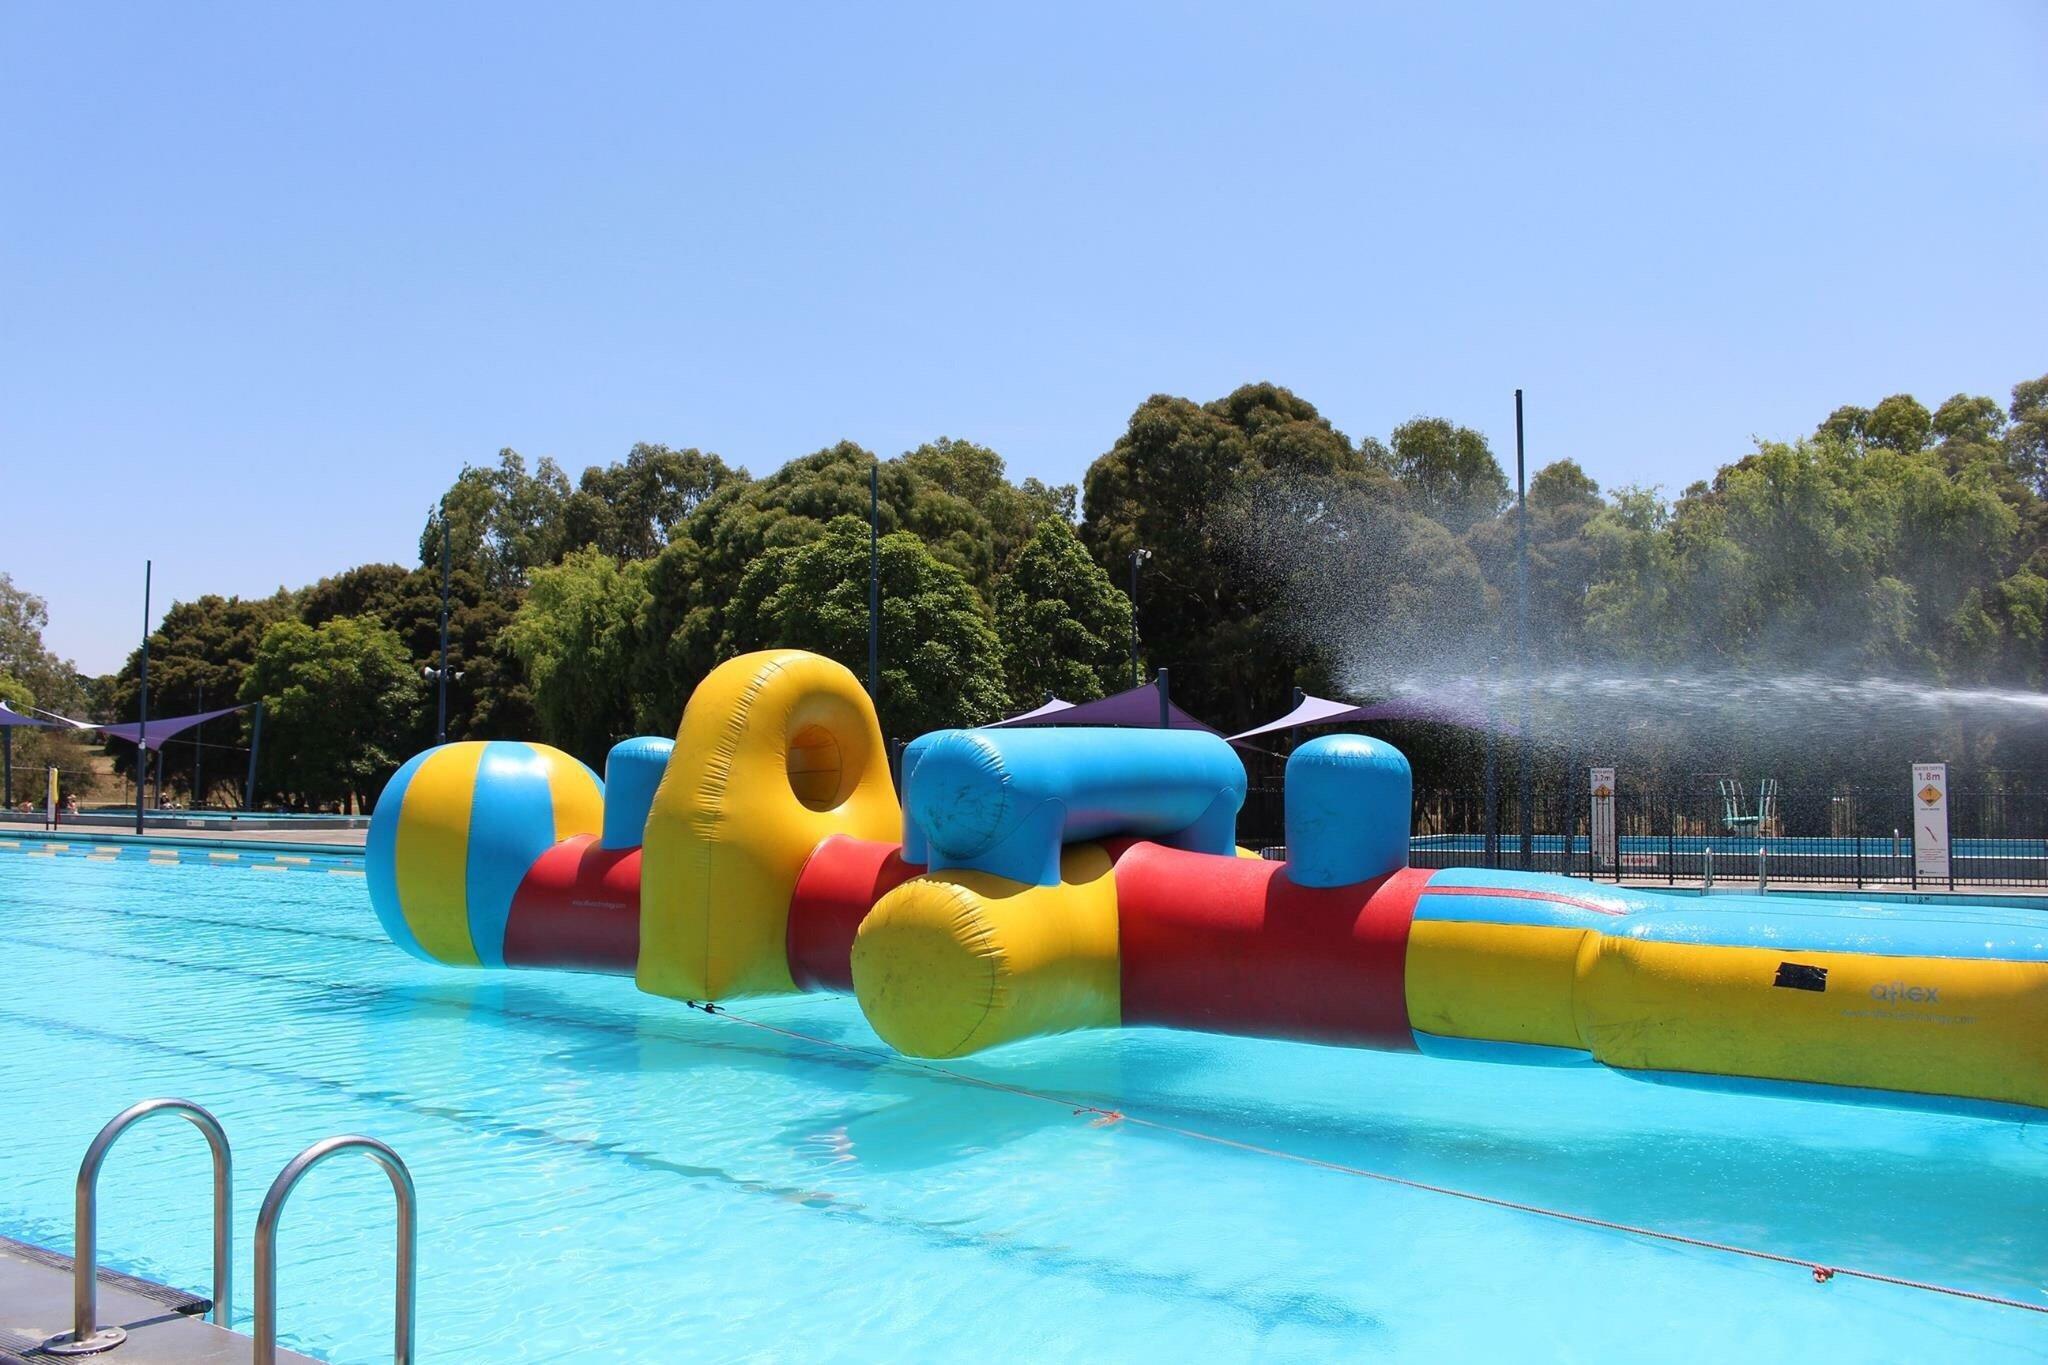 Coburg olympic swimming pool australia top tips before you go tripadvisor - Olympic swimming pool ...